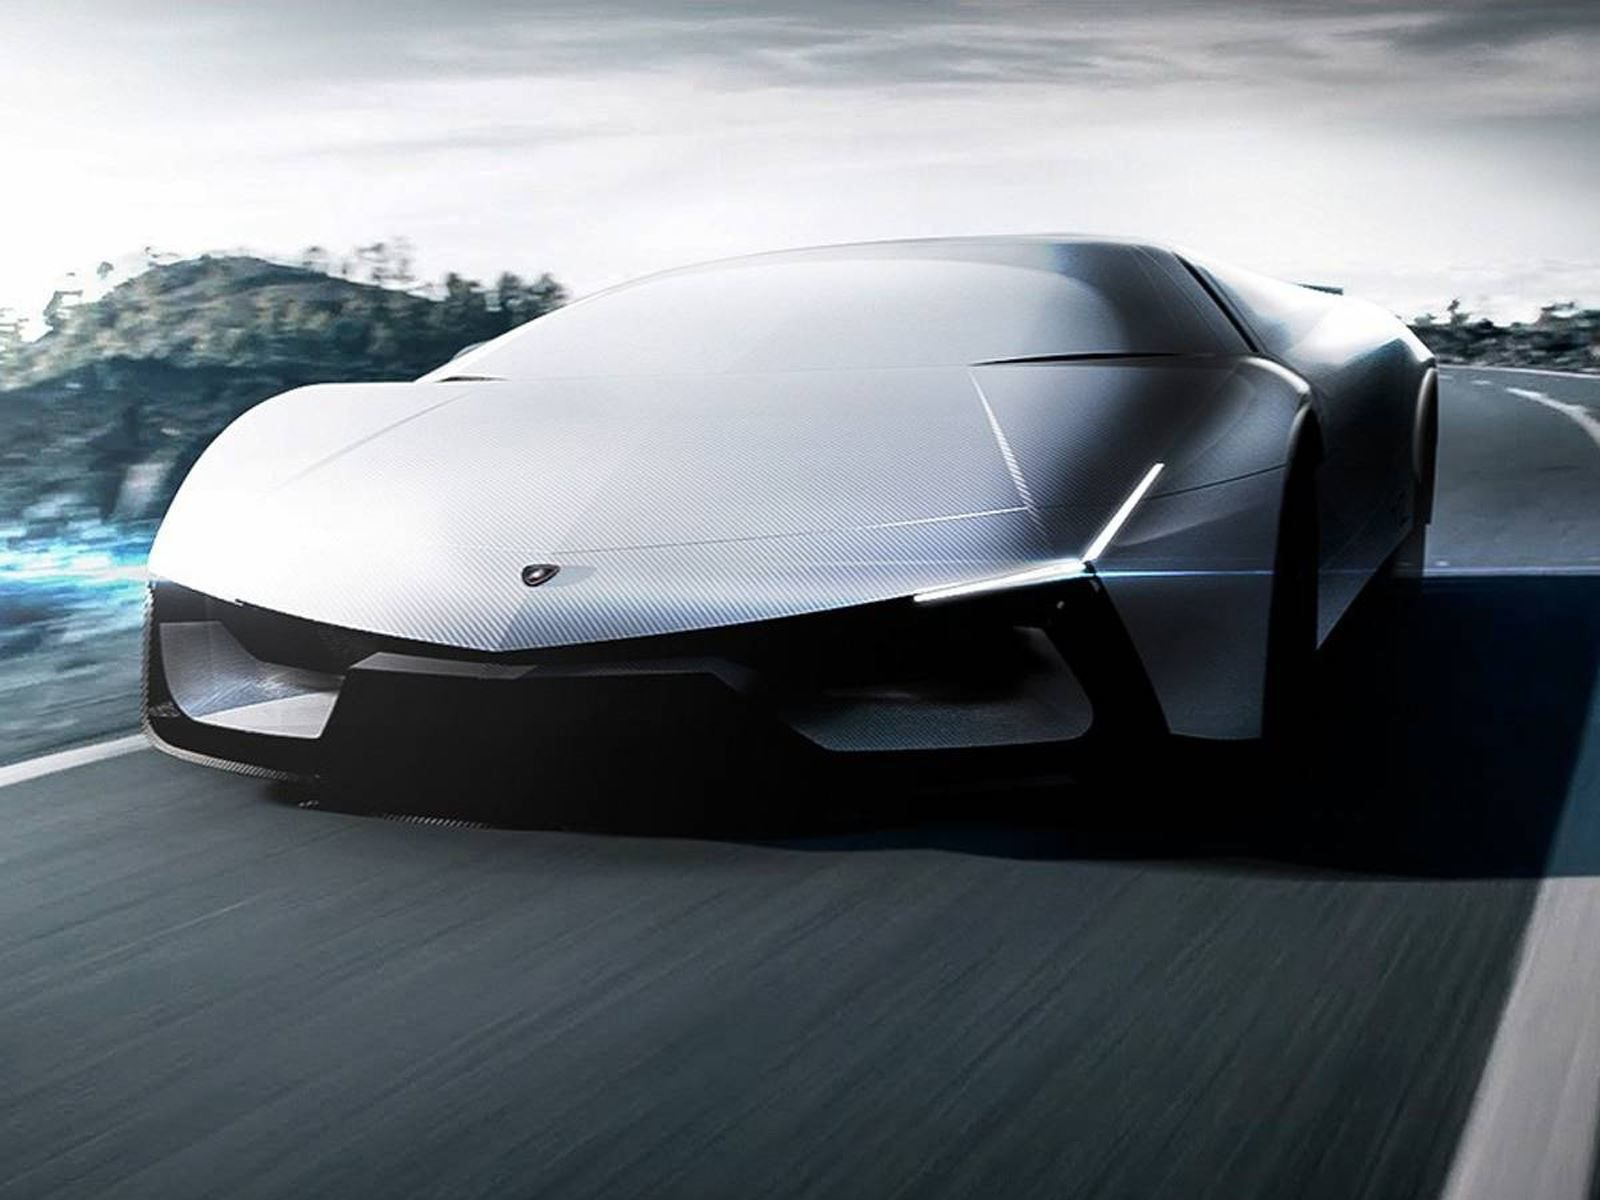 Pura 2022 Electric Lamborghini Supercar Concept Carbuzz